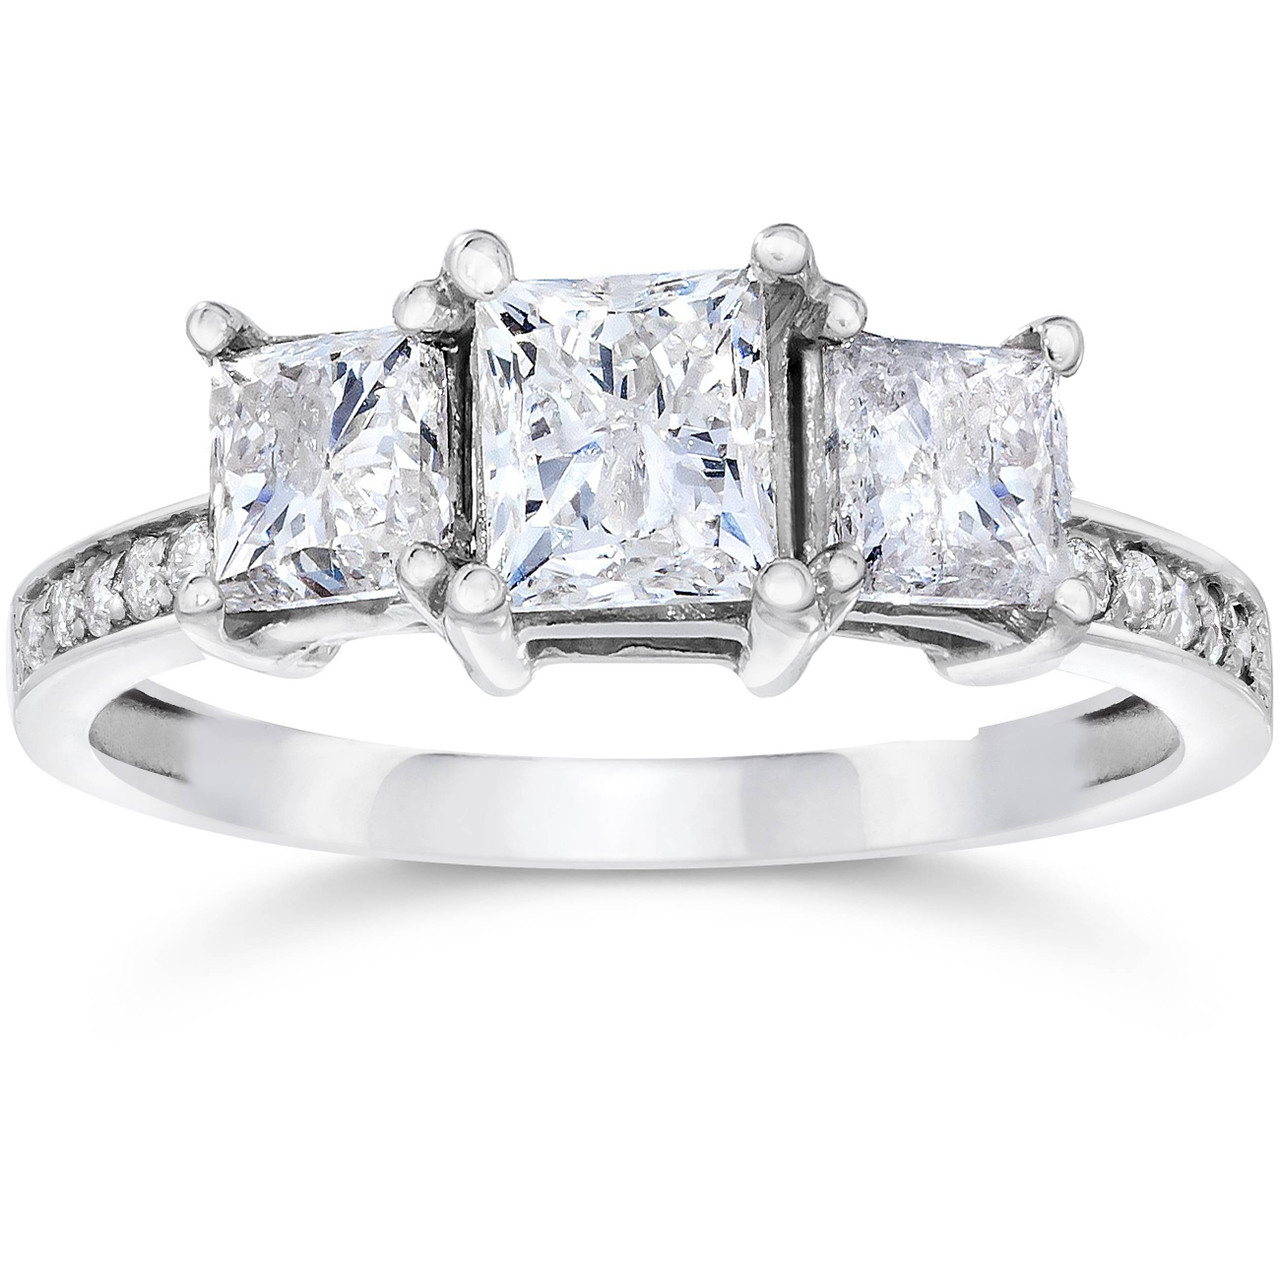 2ct Three Stone Princess Cut Diamond Engagement Ring 14k White Gold